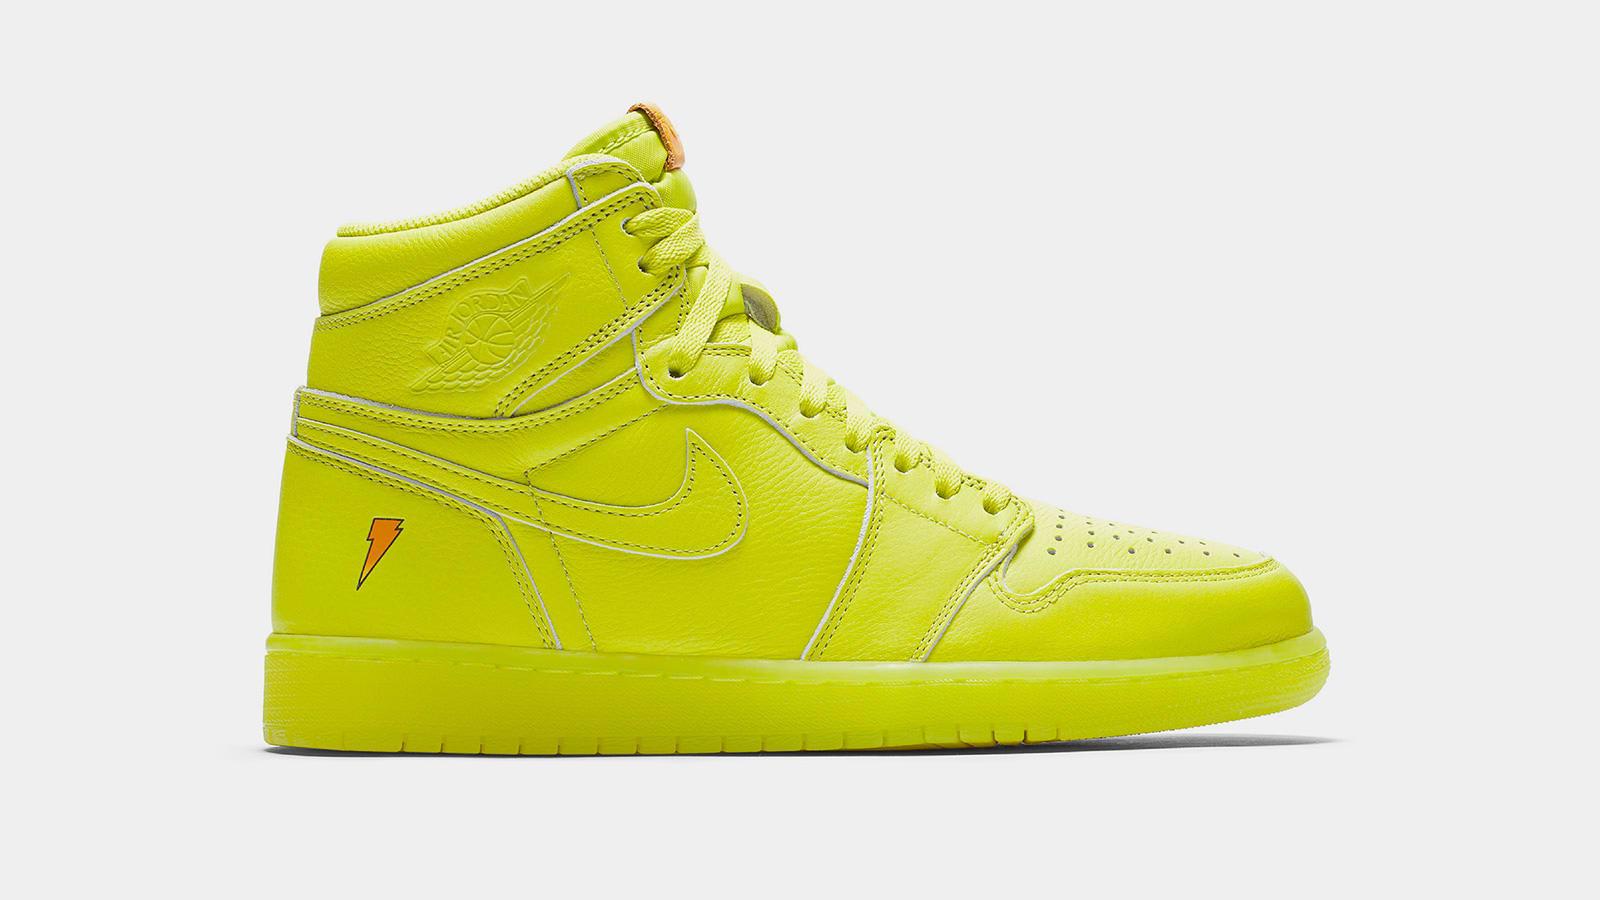 vídeo Accidentalmente Frotar  END. Features | Nike Air Jordan 1 Retro OG 'Gatorade' Cyber - Enter Raffle  Now